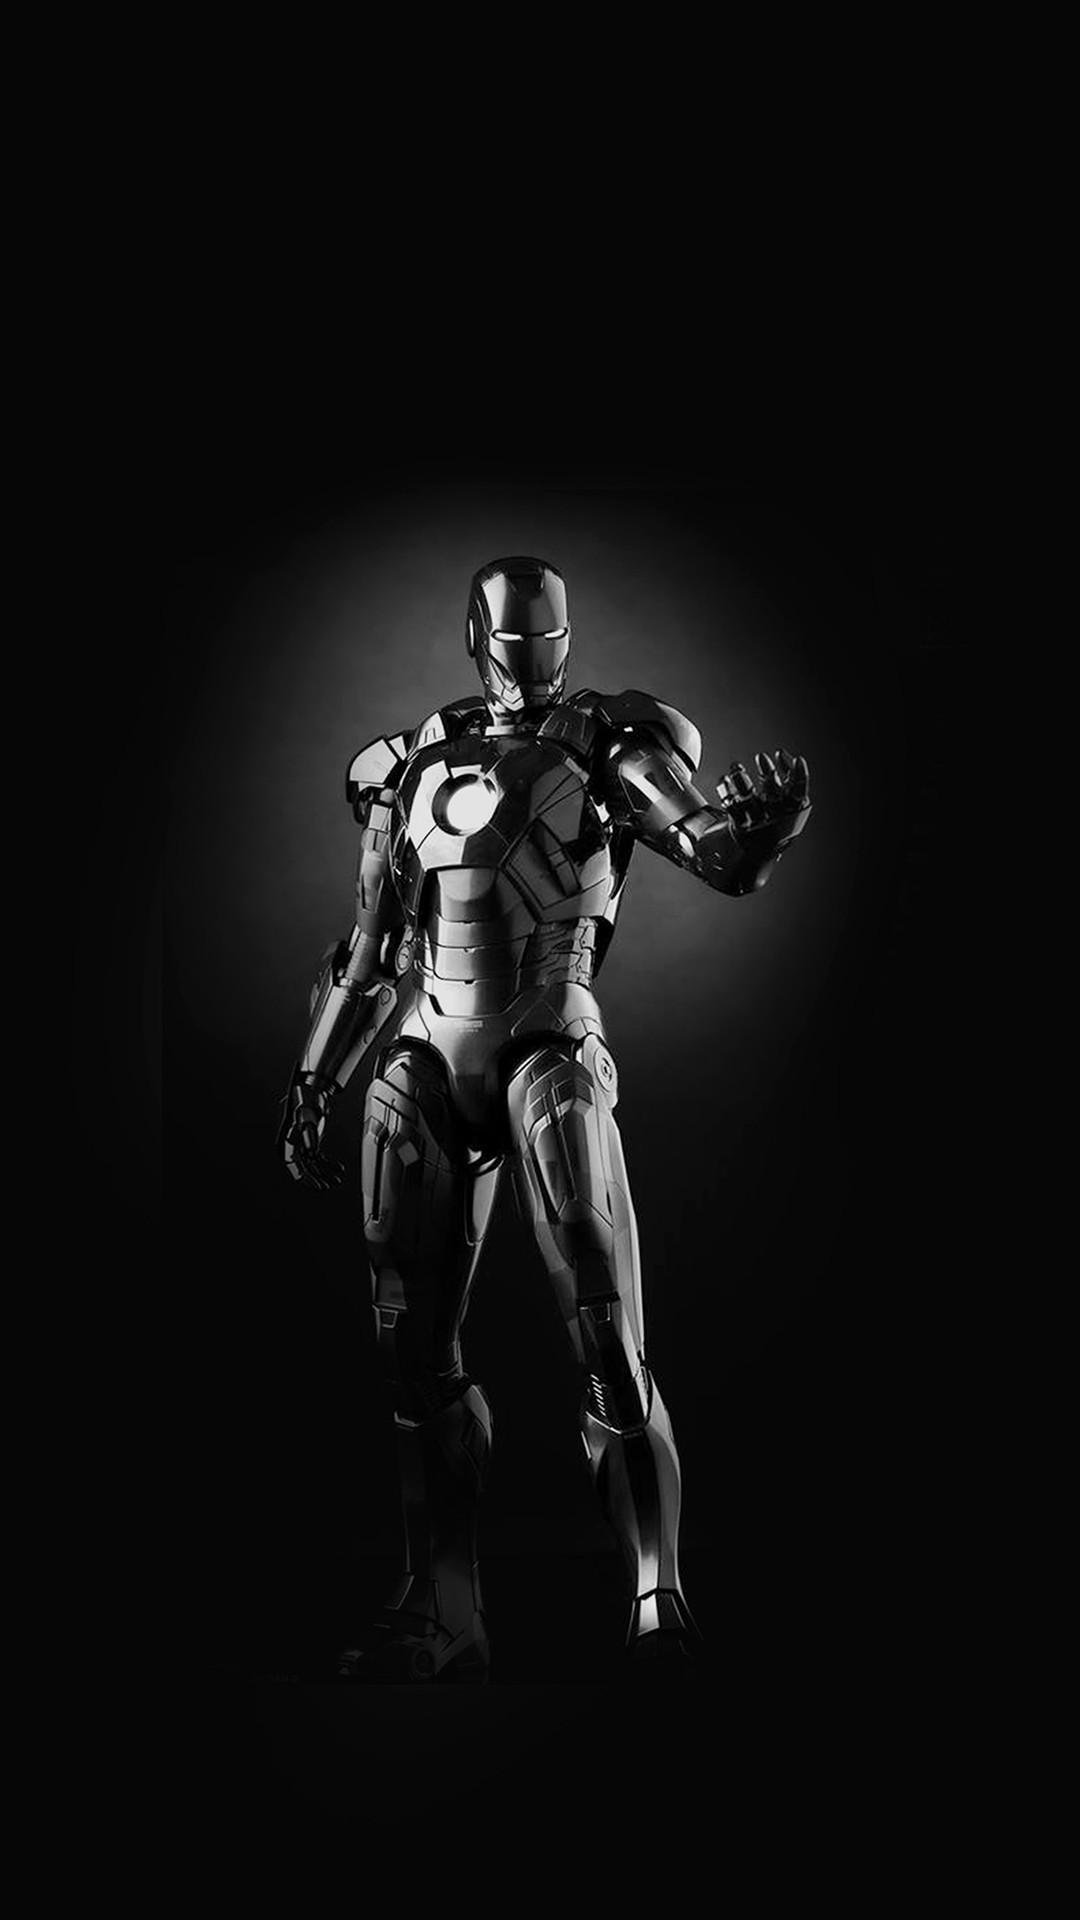 Ironman Dark Figure Hero Art Avengers Bw #iPhone #6 #plus #wallpaper